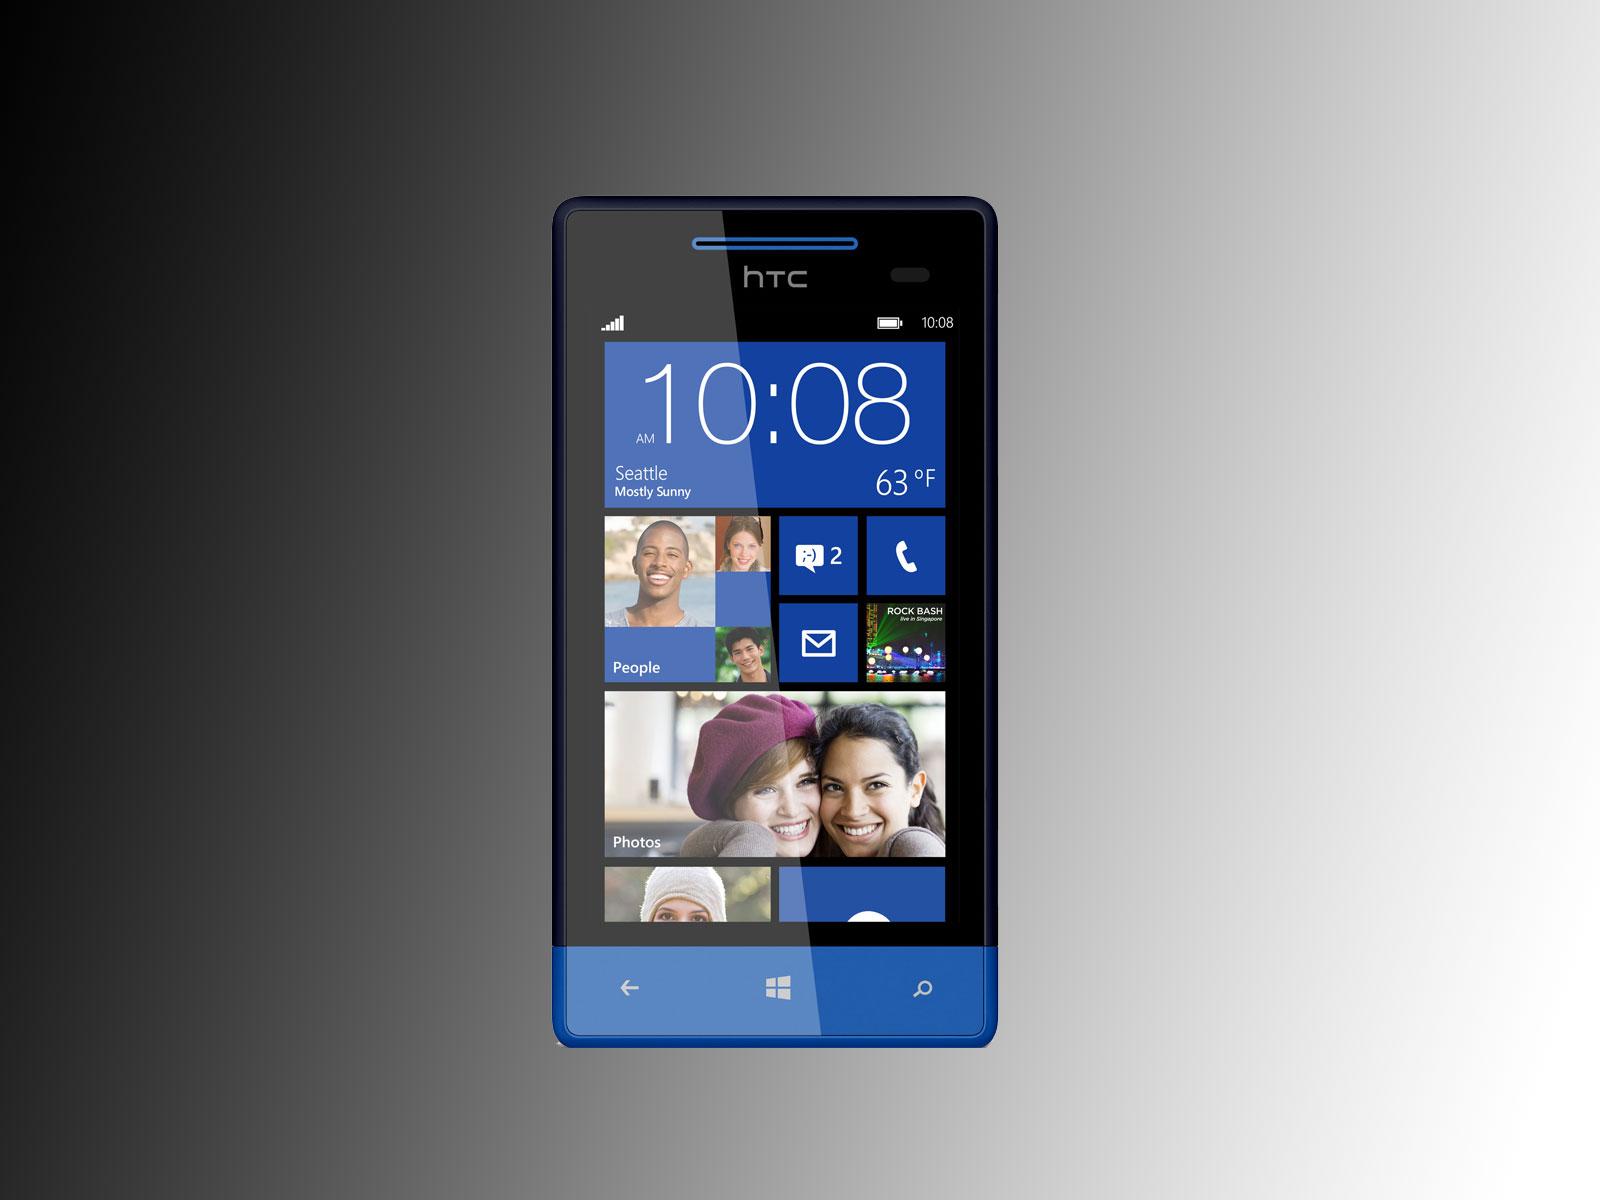 HTC-Windows-Phone-8s-images.jpg